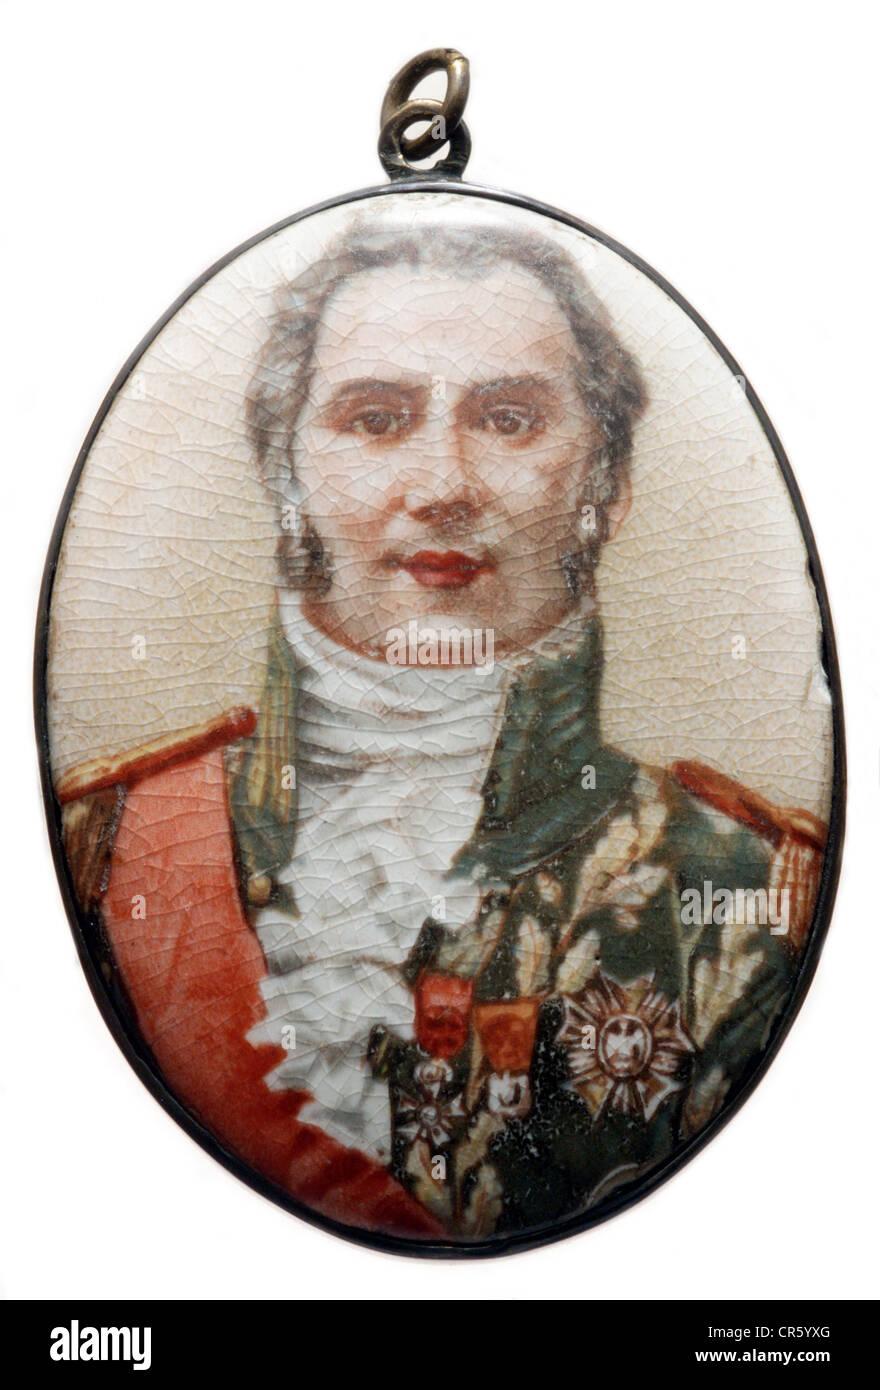 Wellington, Arthur Wellesley Duke of, 1.5.1769 - 14.9.1852, British General, politician, portrait, miniature painting - Stock Image